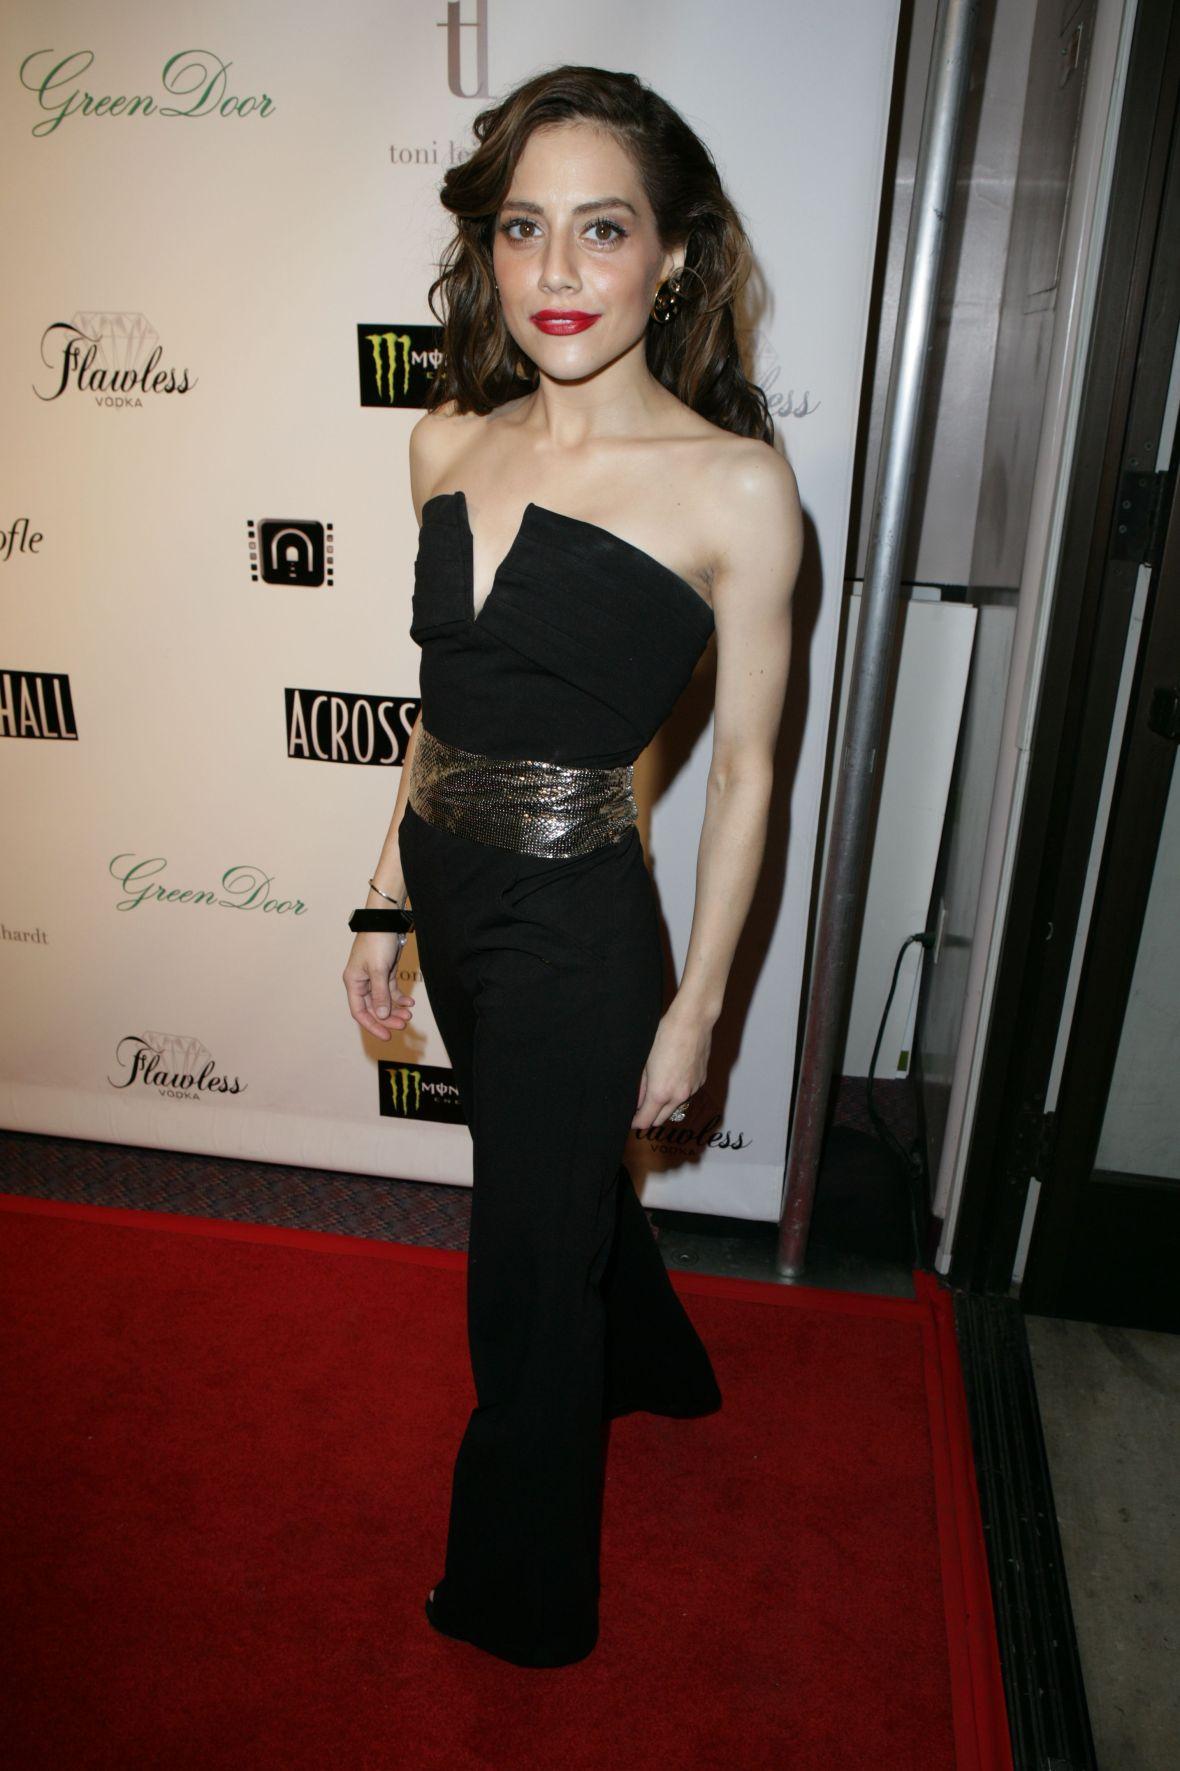 Brittany Murphy Wearing a Black Dress